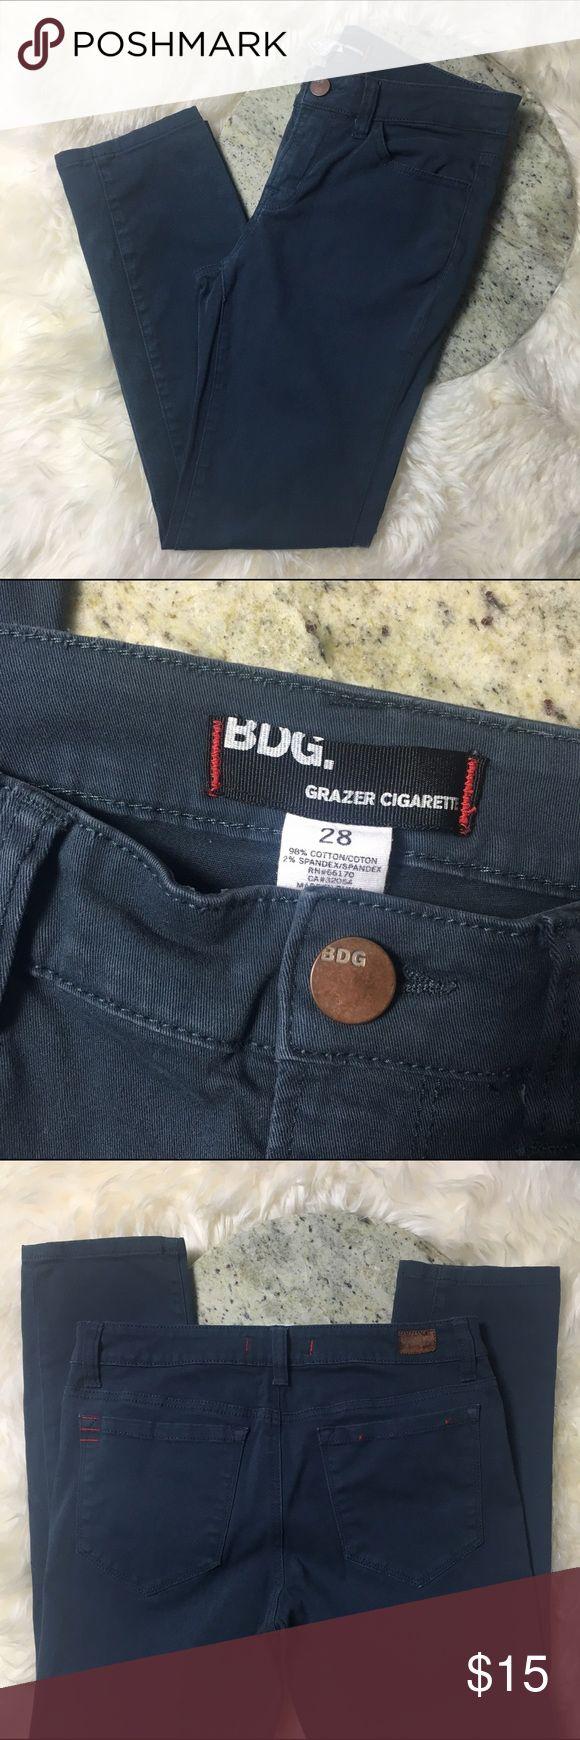 Navy Blue BDG Glazer Cigarette Pants Navy blue pants 98% Cotton 2% Spandex. Great pre owned condition! BDG Pants